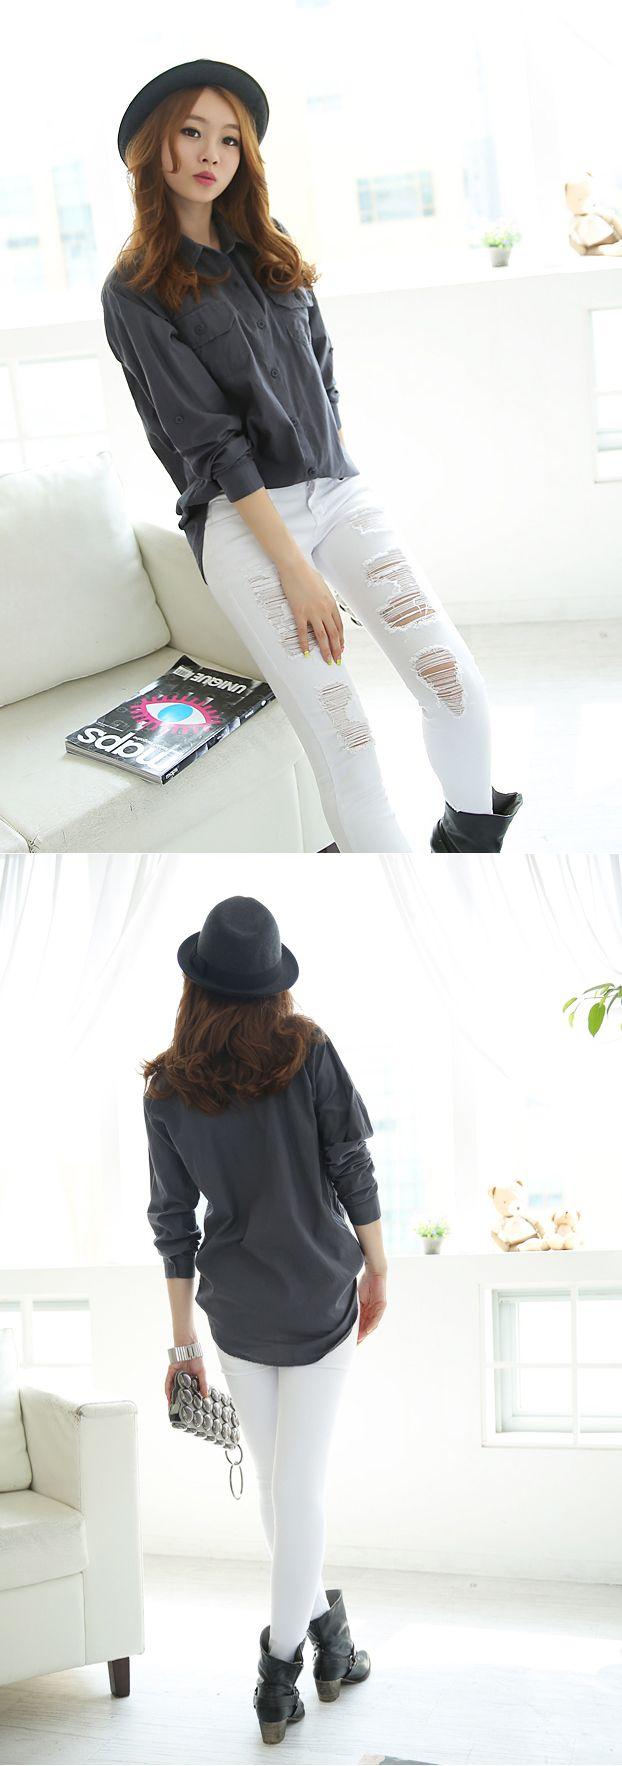 Black dress qoo10 - Qoo10 Singapore Grey Shirt White Distressed Pants With Fedora Fashion Style